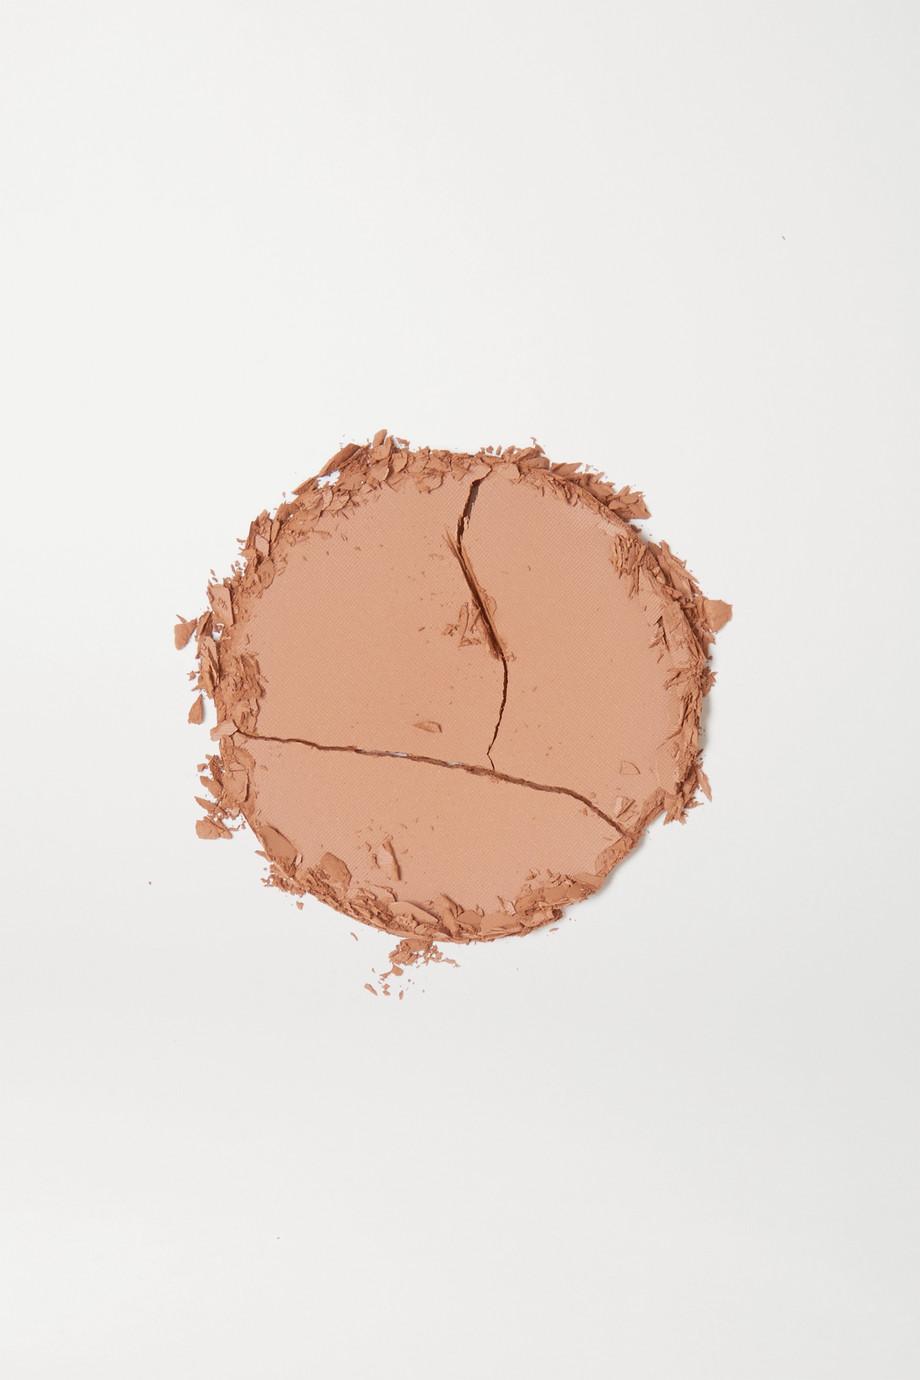 Charlotte Tilbury Airbrush Flawless Finish Micro-Powder - 3 Tan